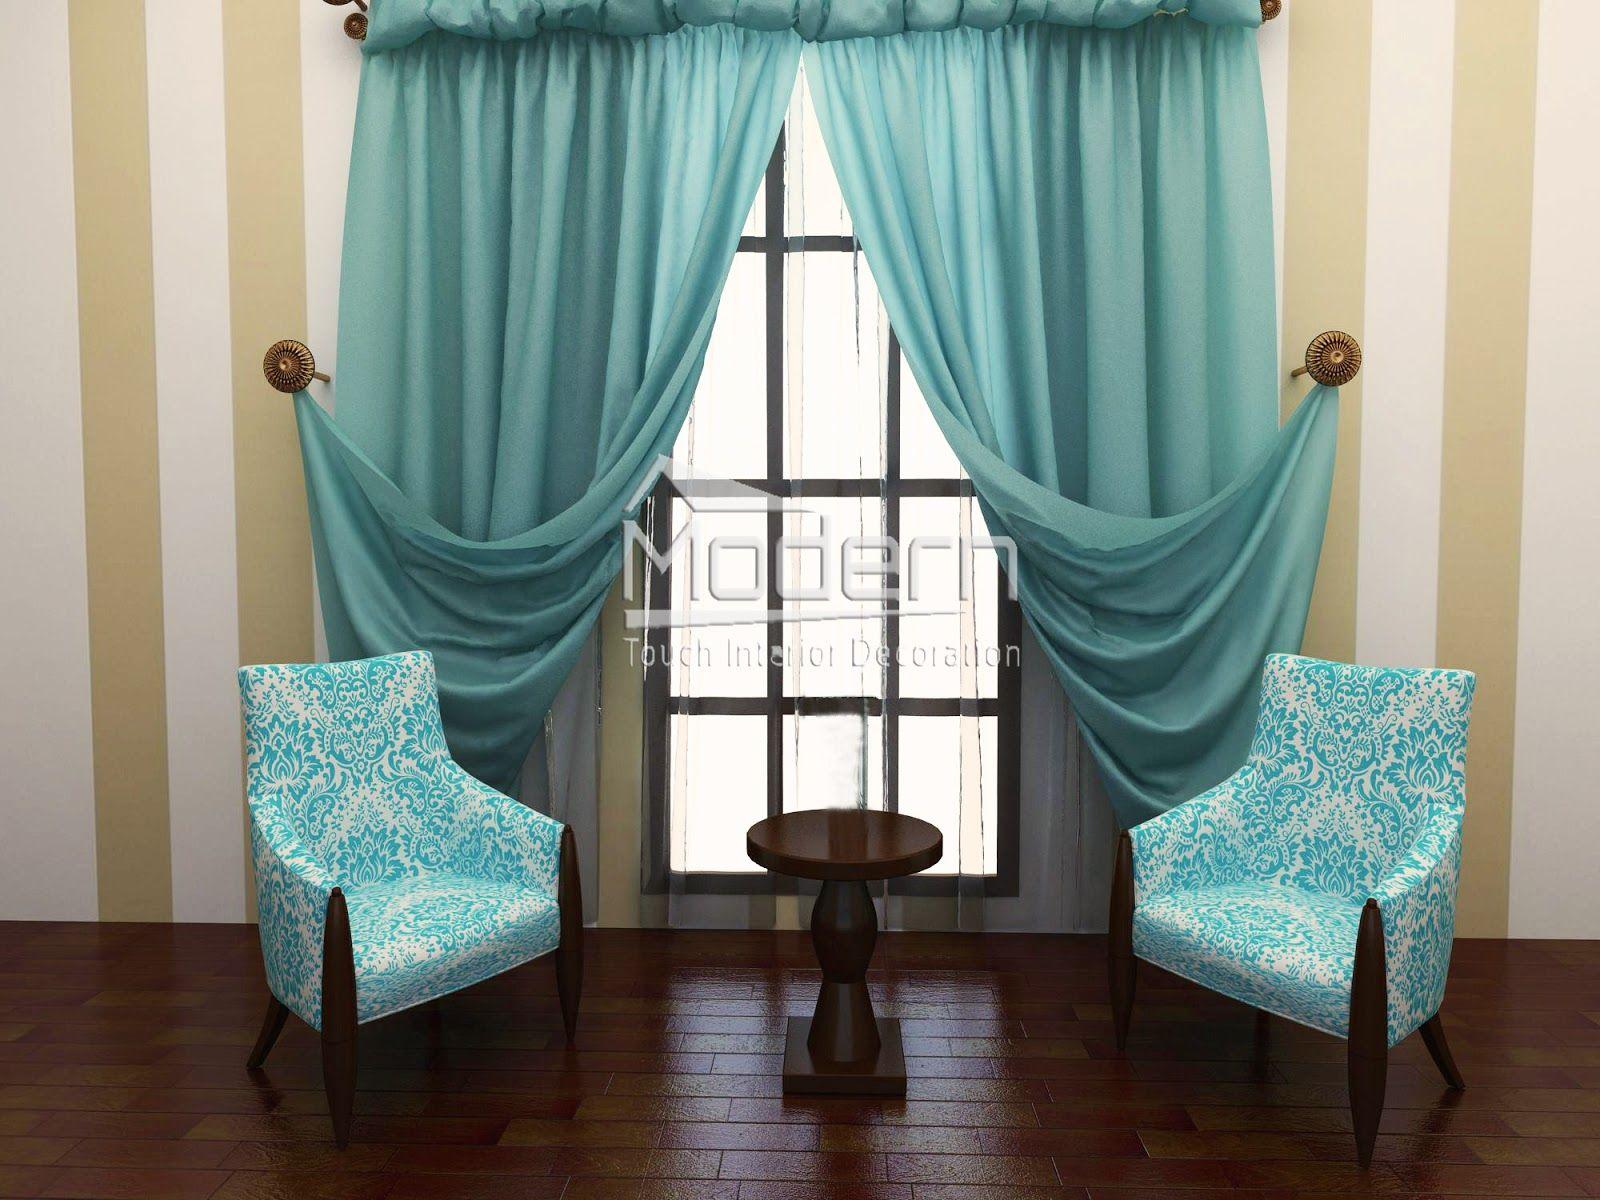 Interior design hanging curtains - Explore Hanging Curtains Curtain Ideas And More